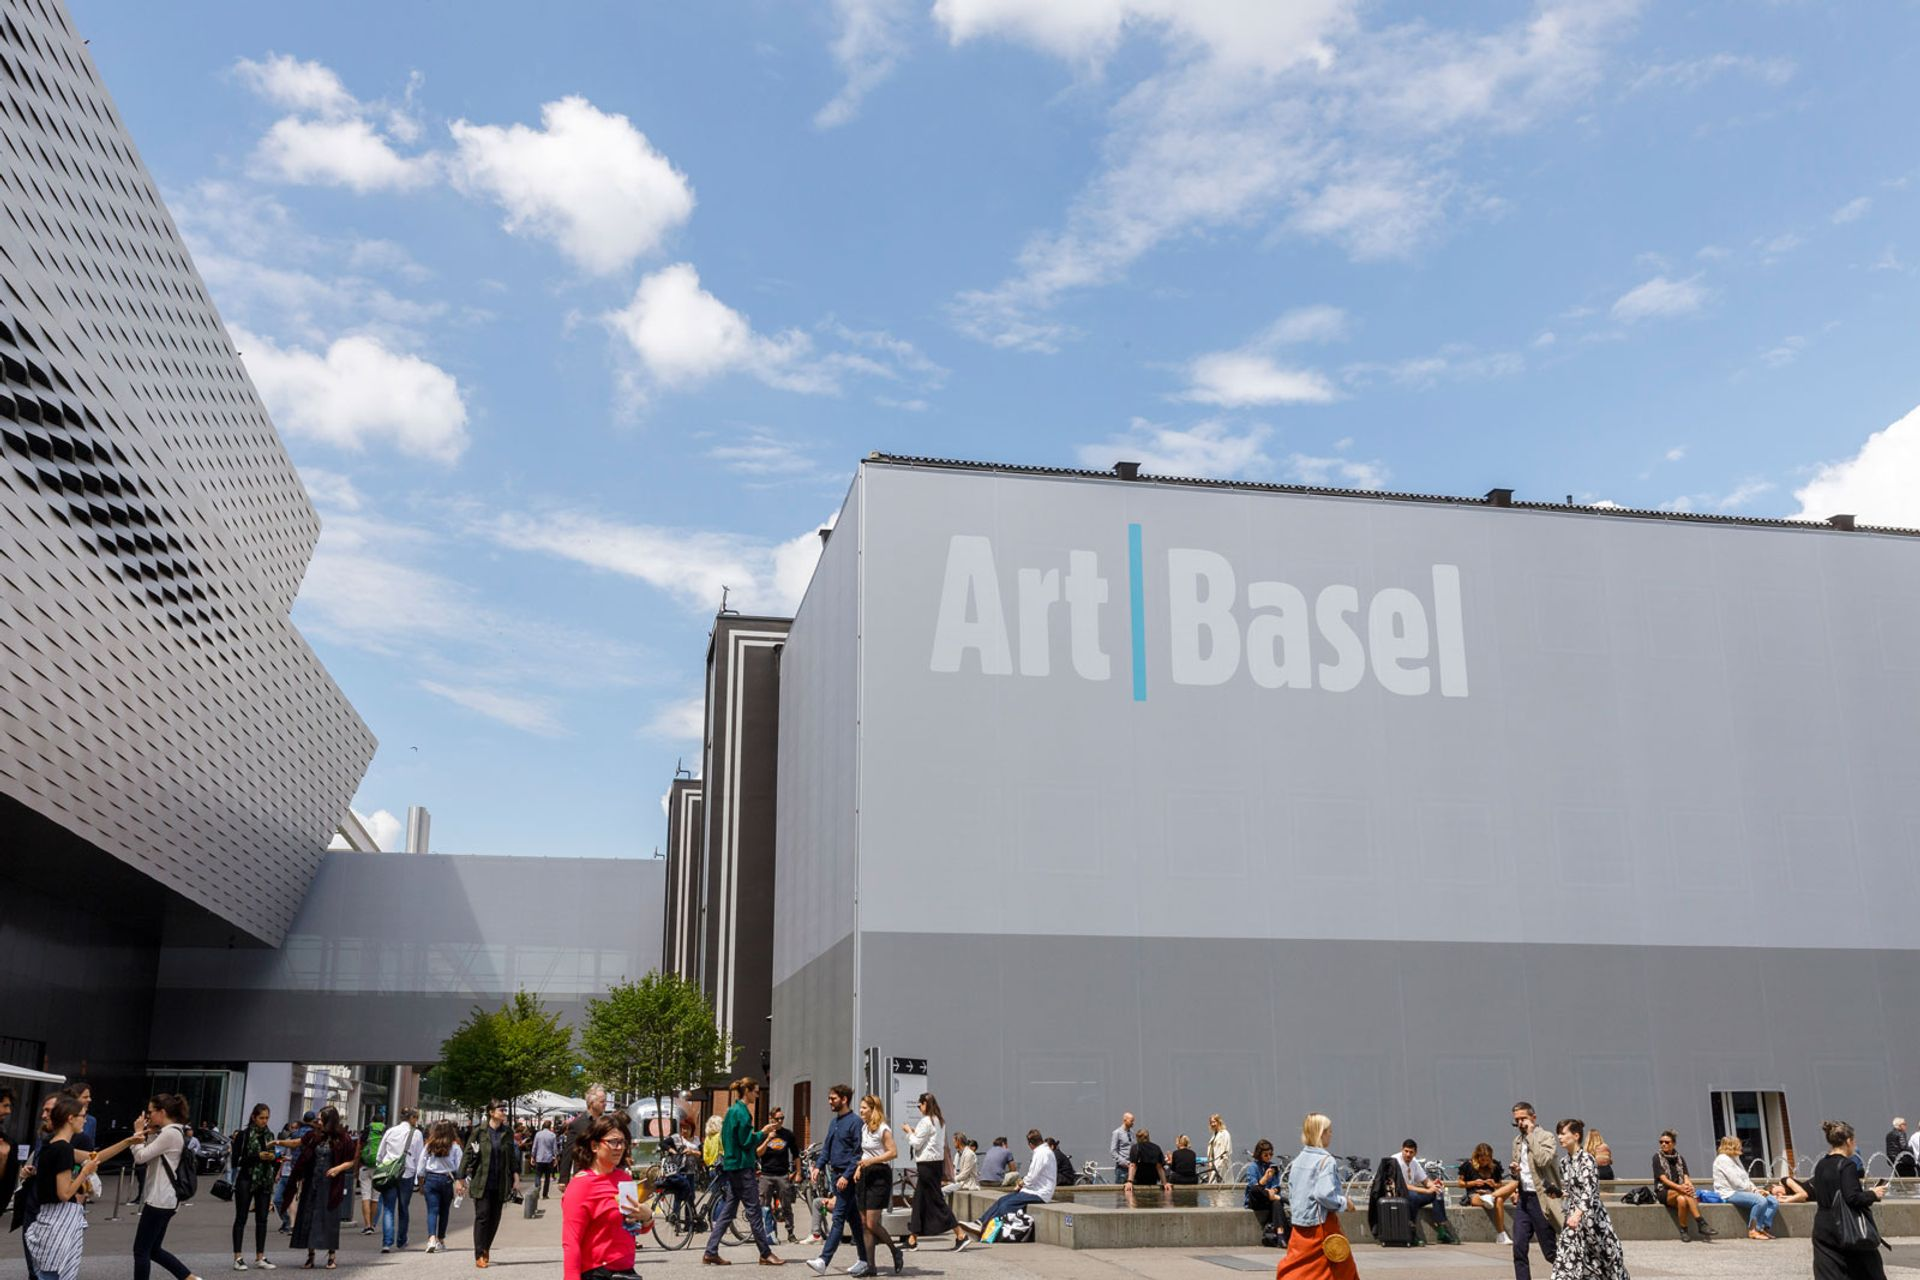 The Art Basel fair has been postponed to the autumn because of the coronavirus pandemic © Art Basel